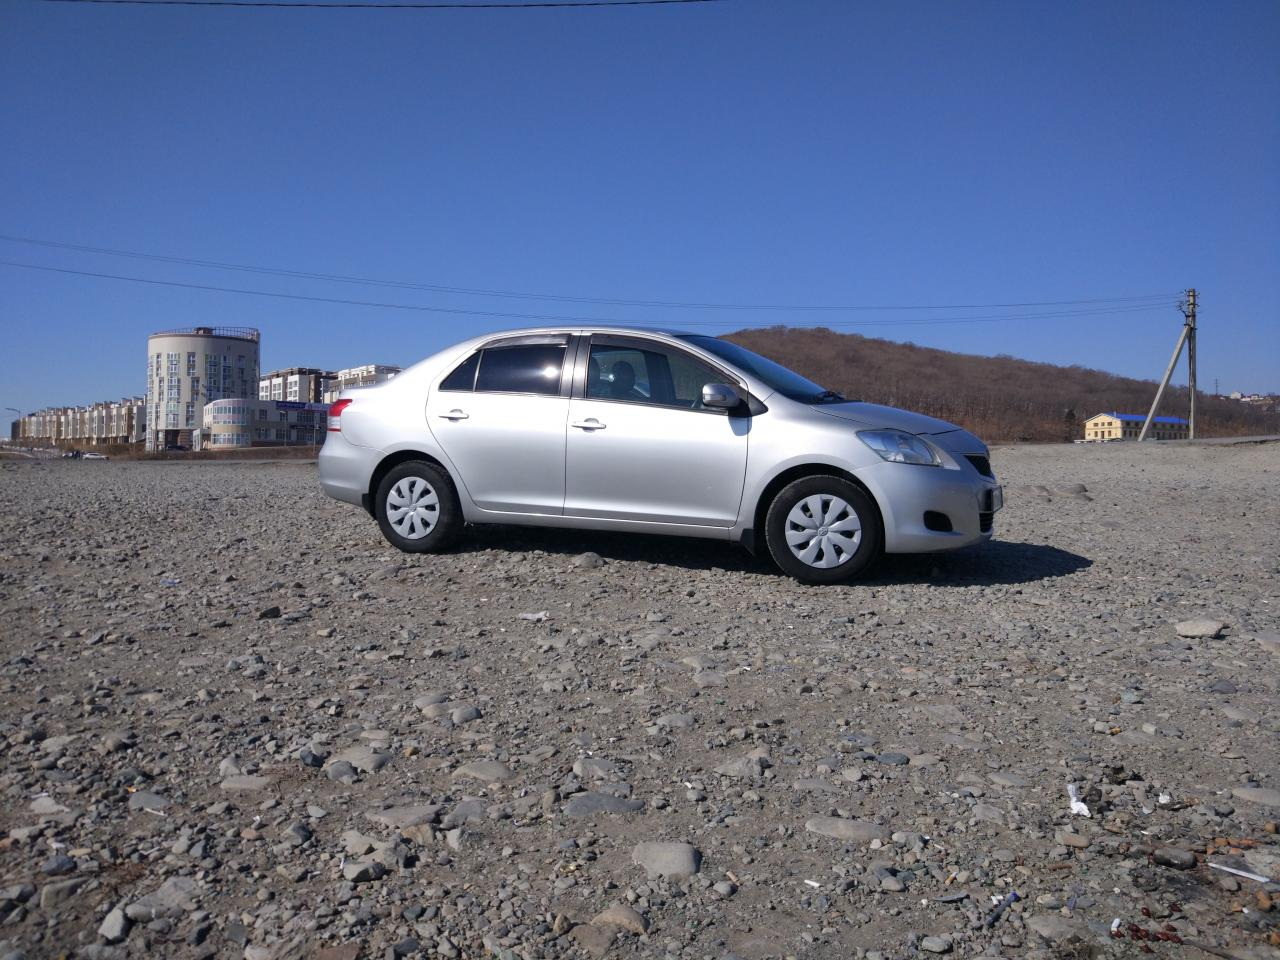 Toyota Brevis 2010 г.в. г.Владивосток - фото 2